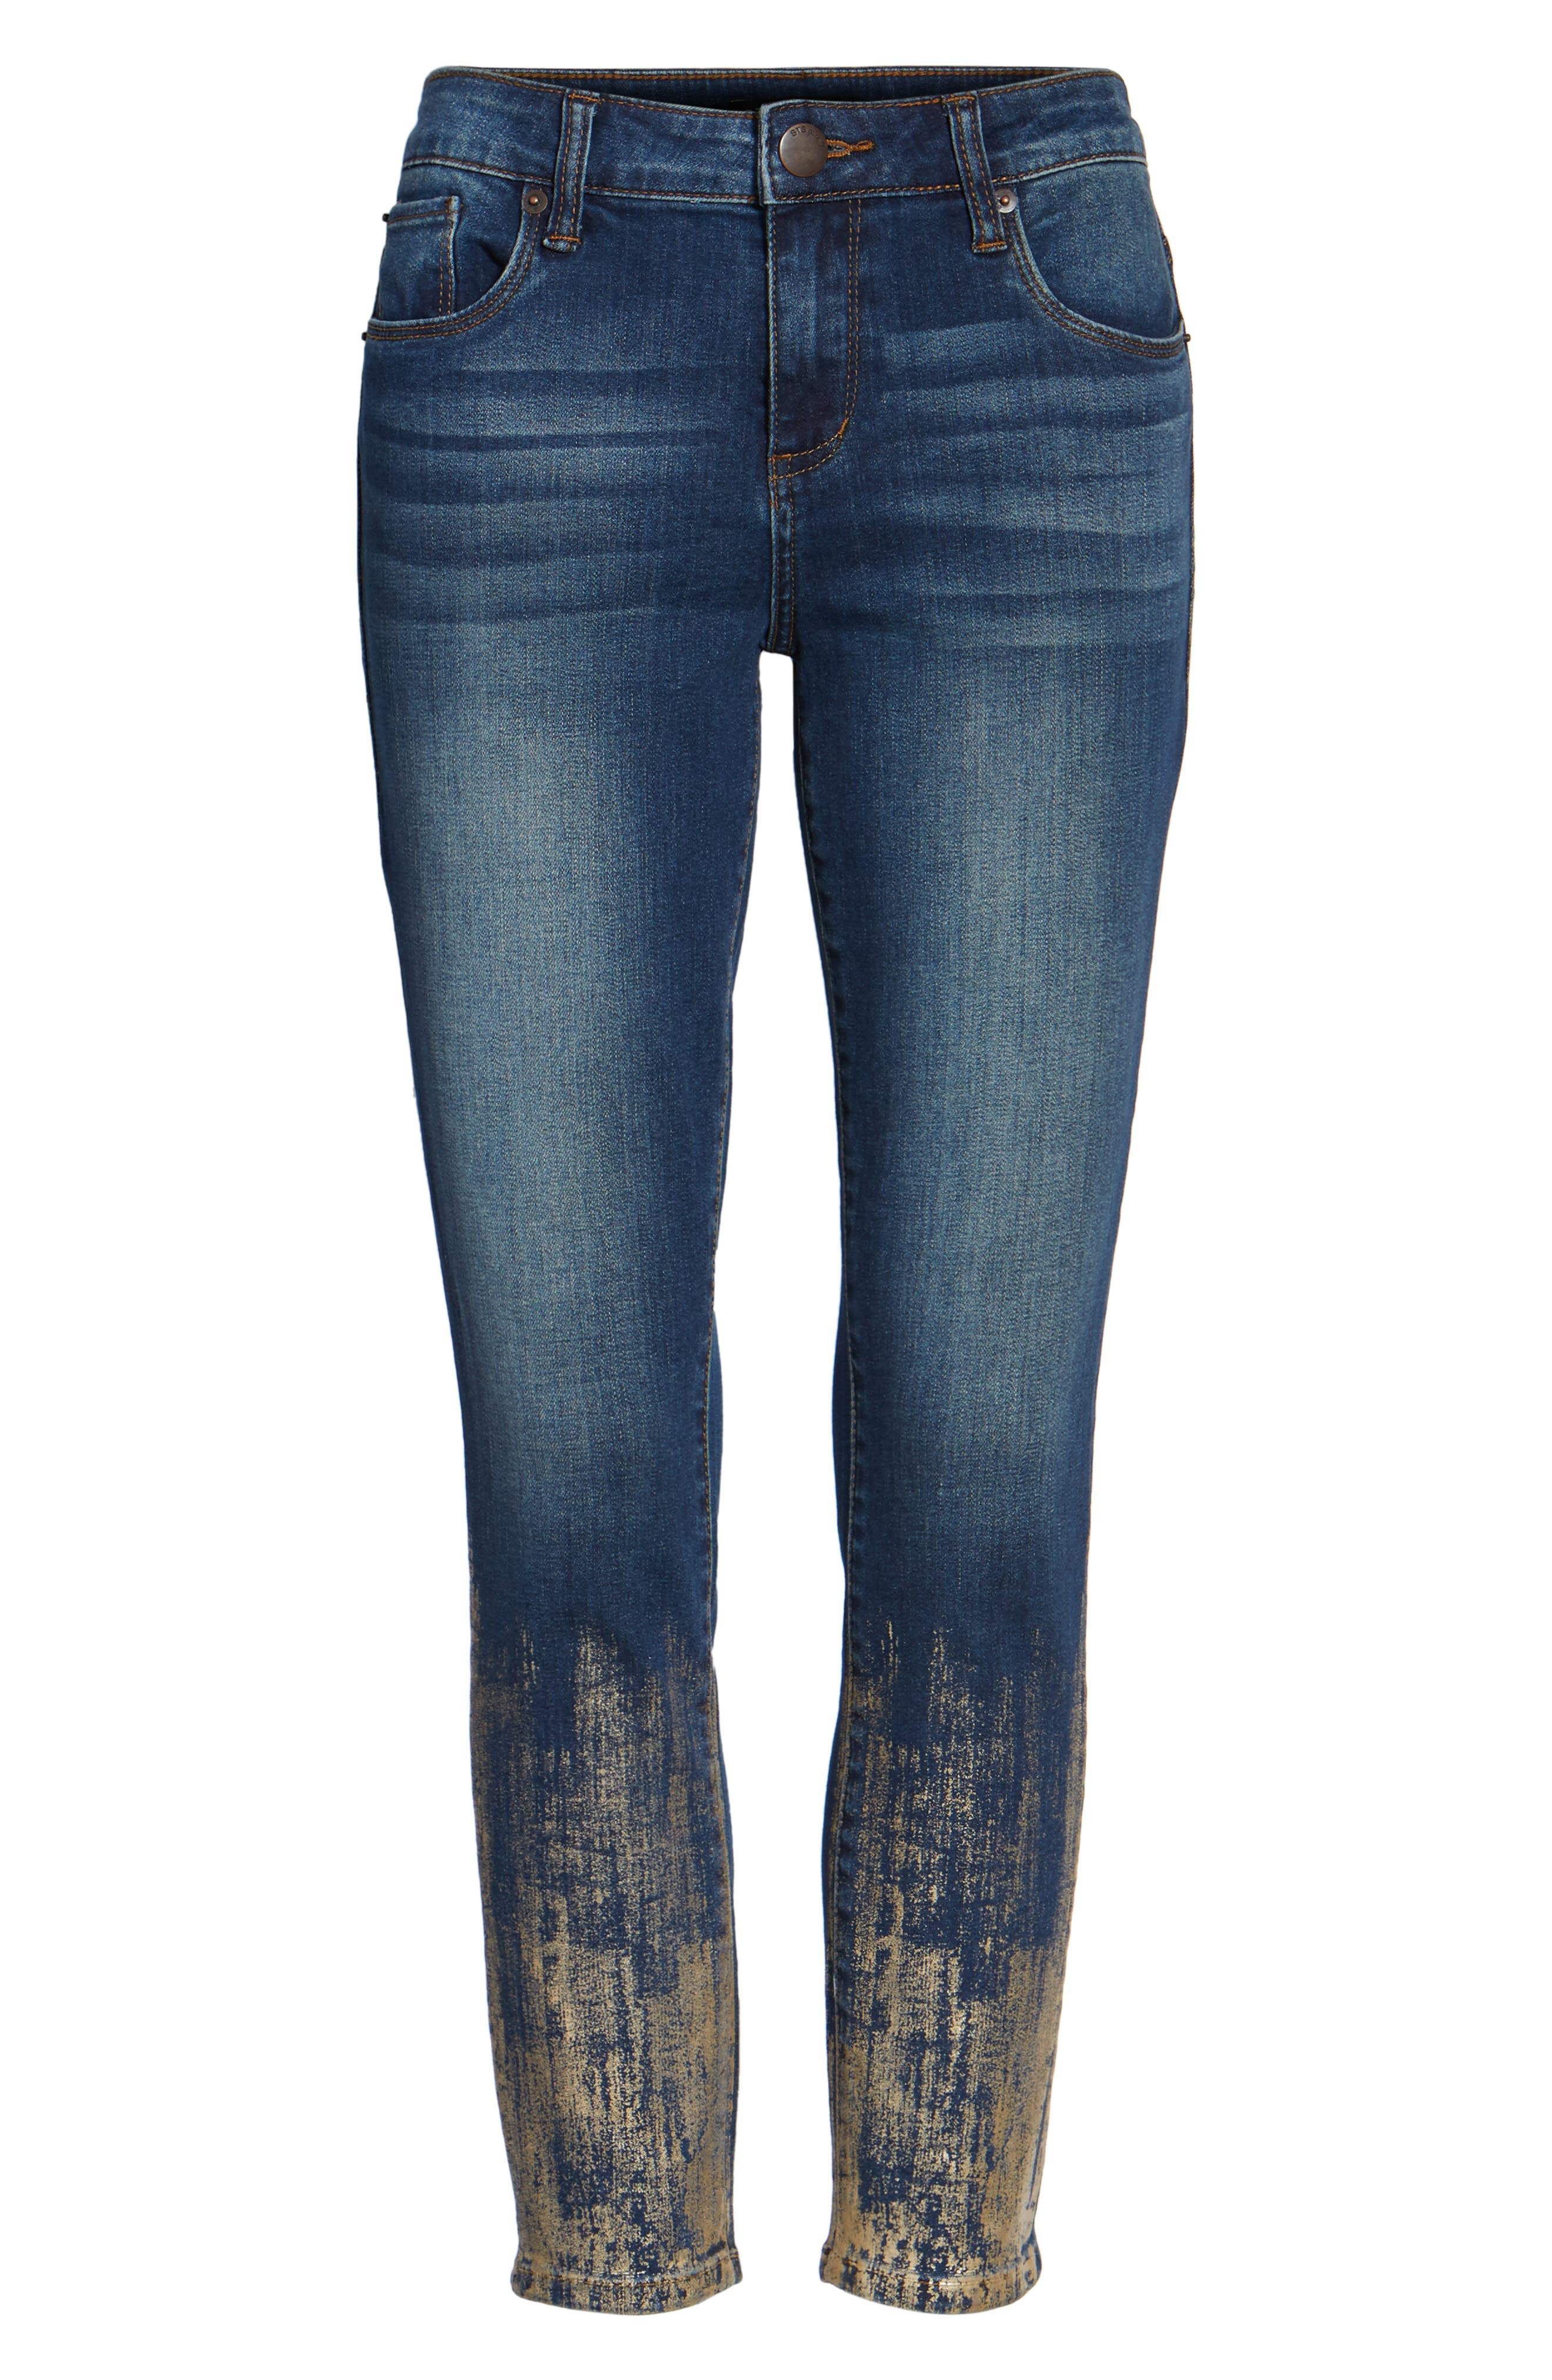 Piper Foil Crop Skinny Jeans,                             Alternate thumbnail 6, color,                             400